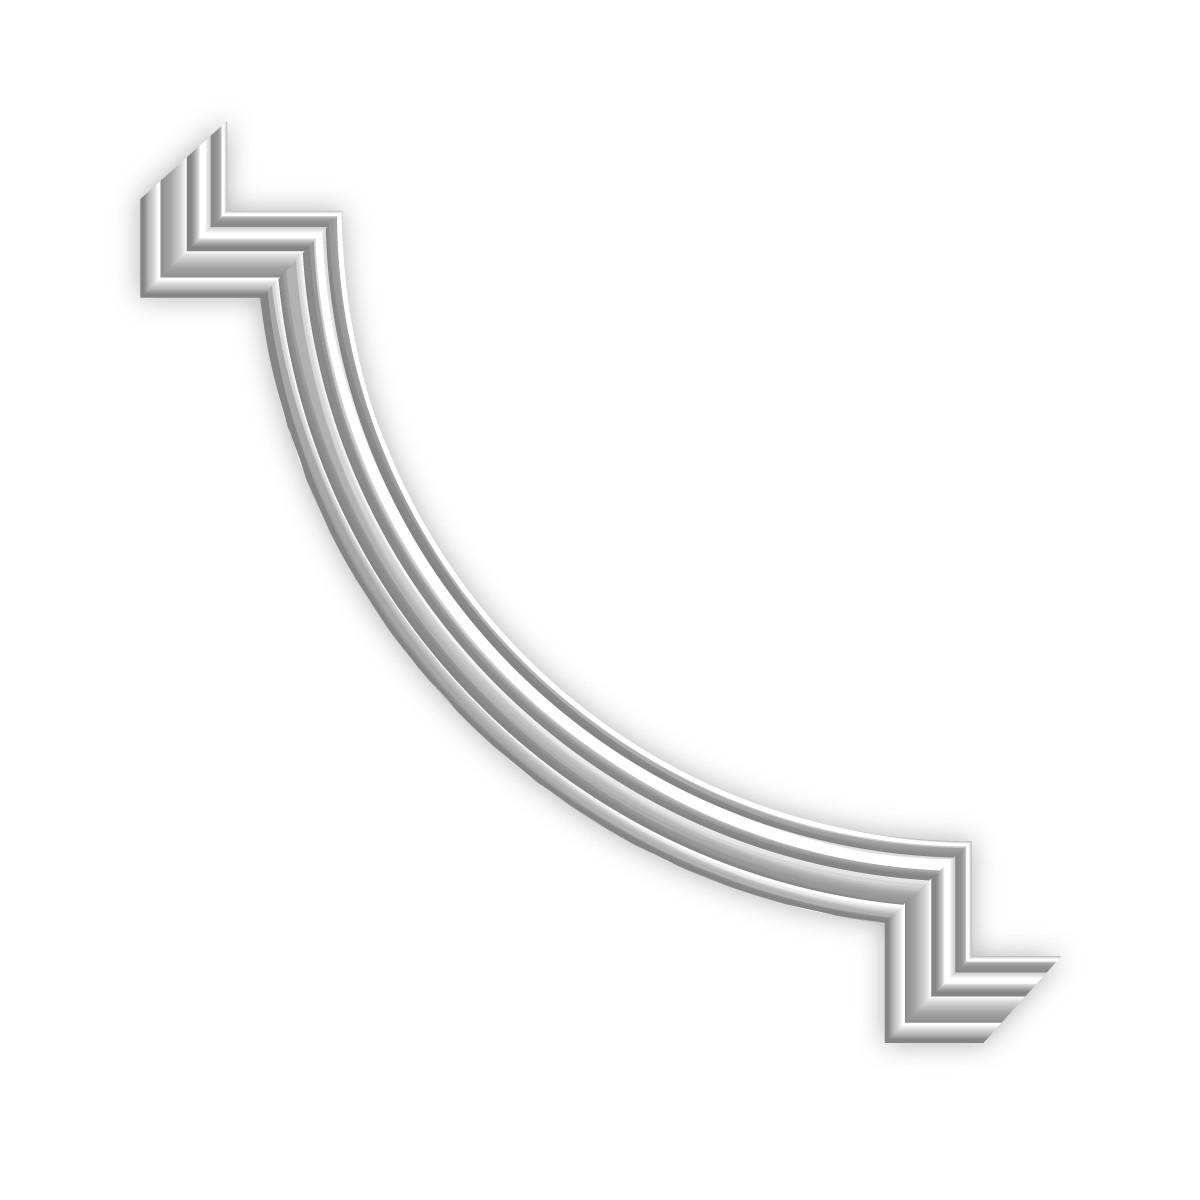 Гипсовая лепнина декоративный угол у-21 h135х135мм, фото 1